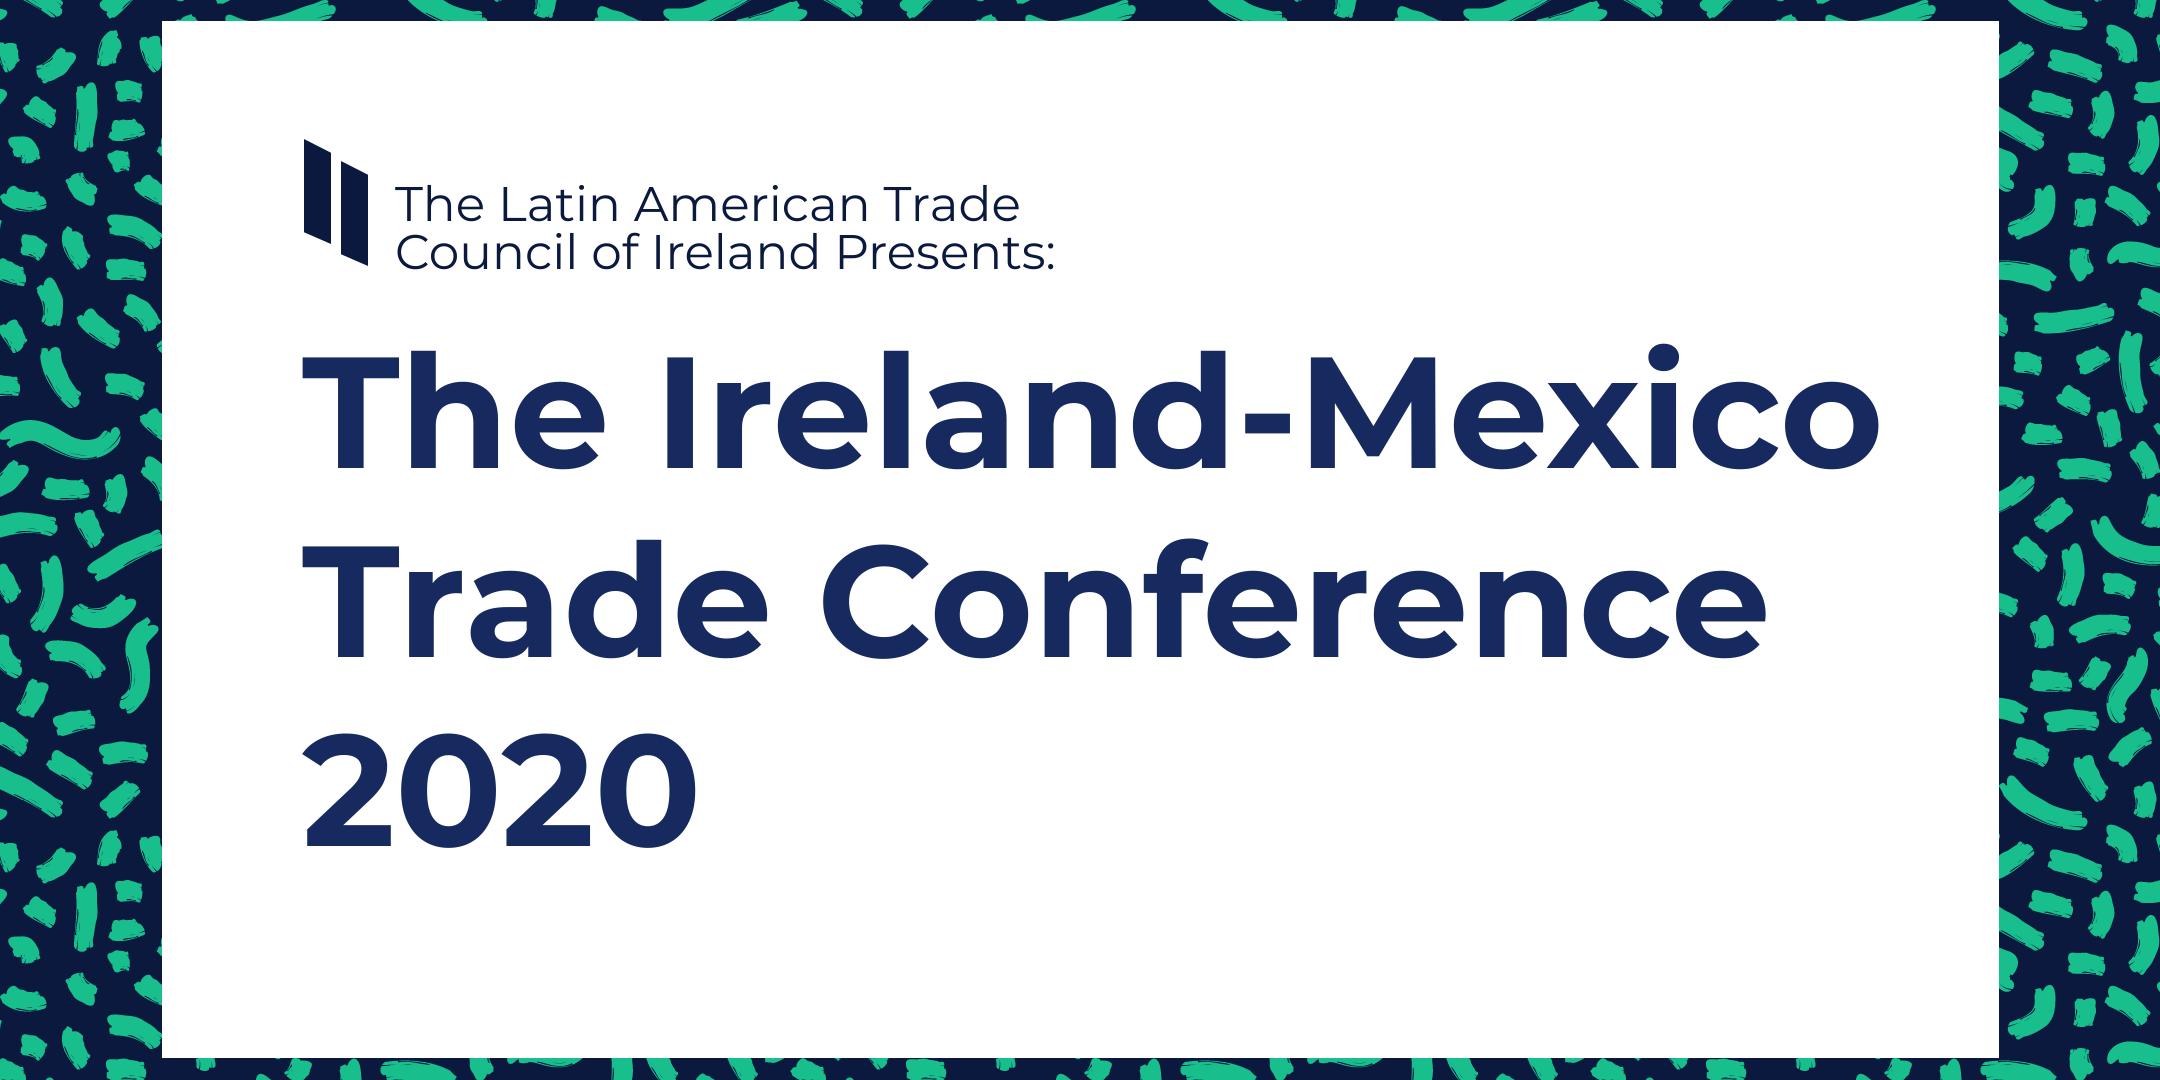 The Ireland-Mexico Trade Conference 2020